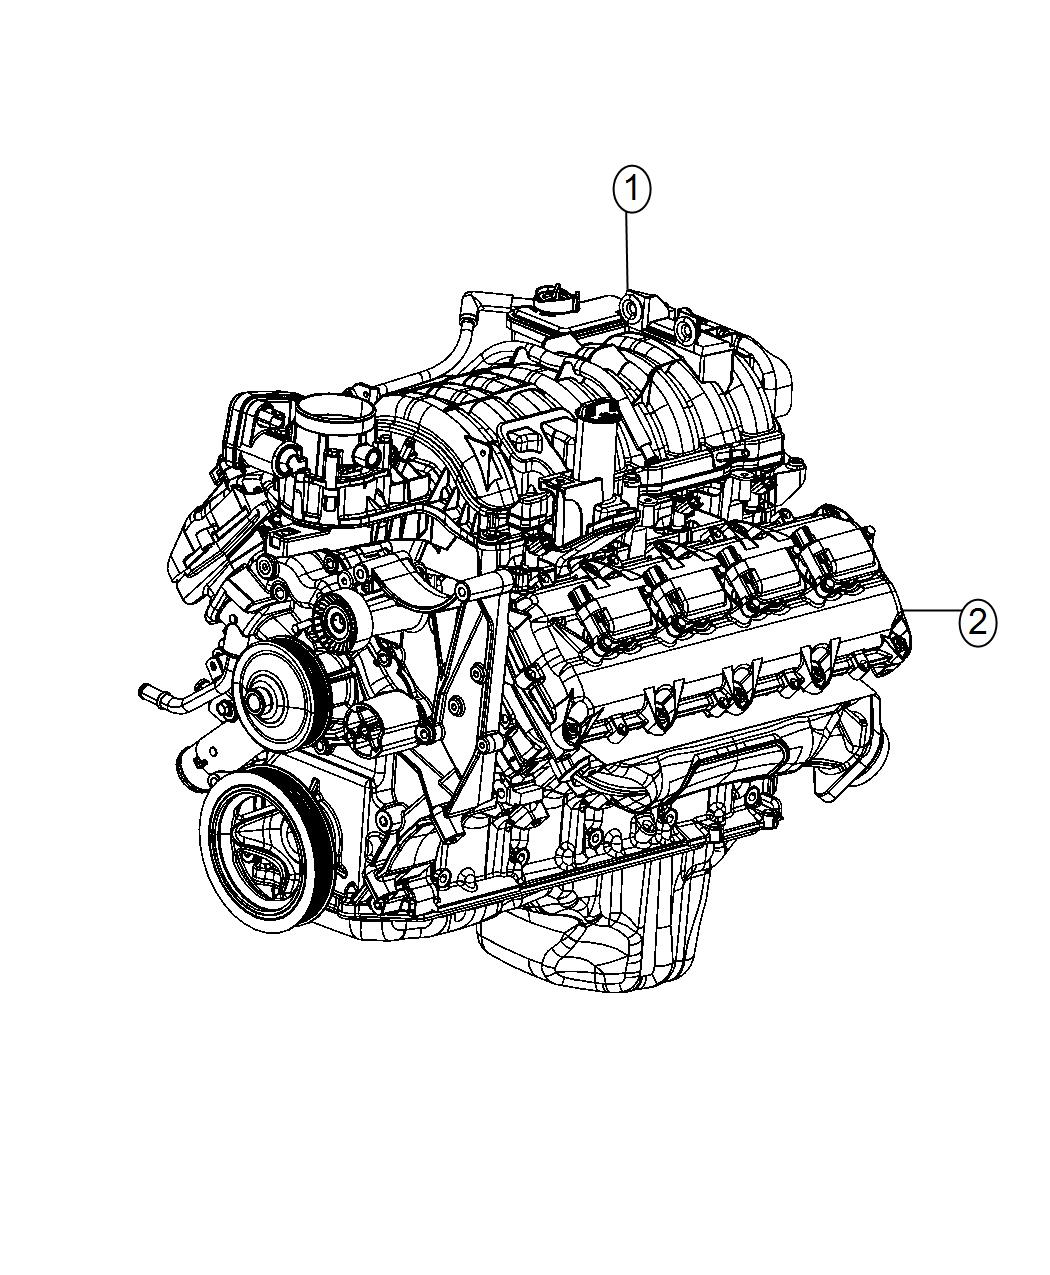 2017 Ram 1500 Engine. Long block. [engine oil cooler